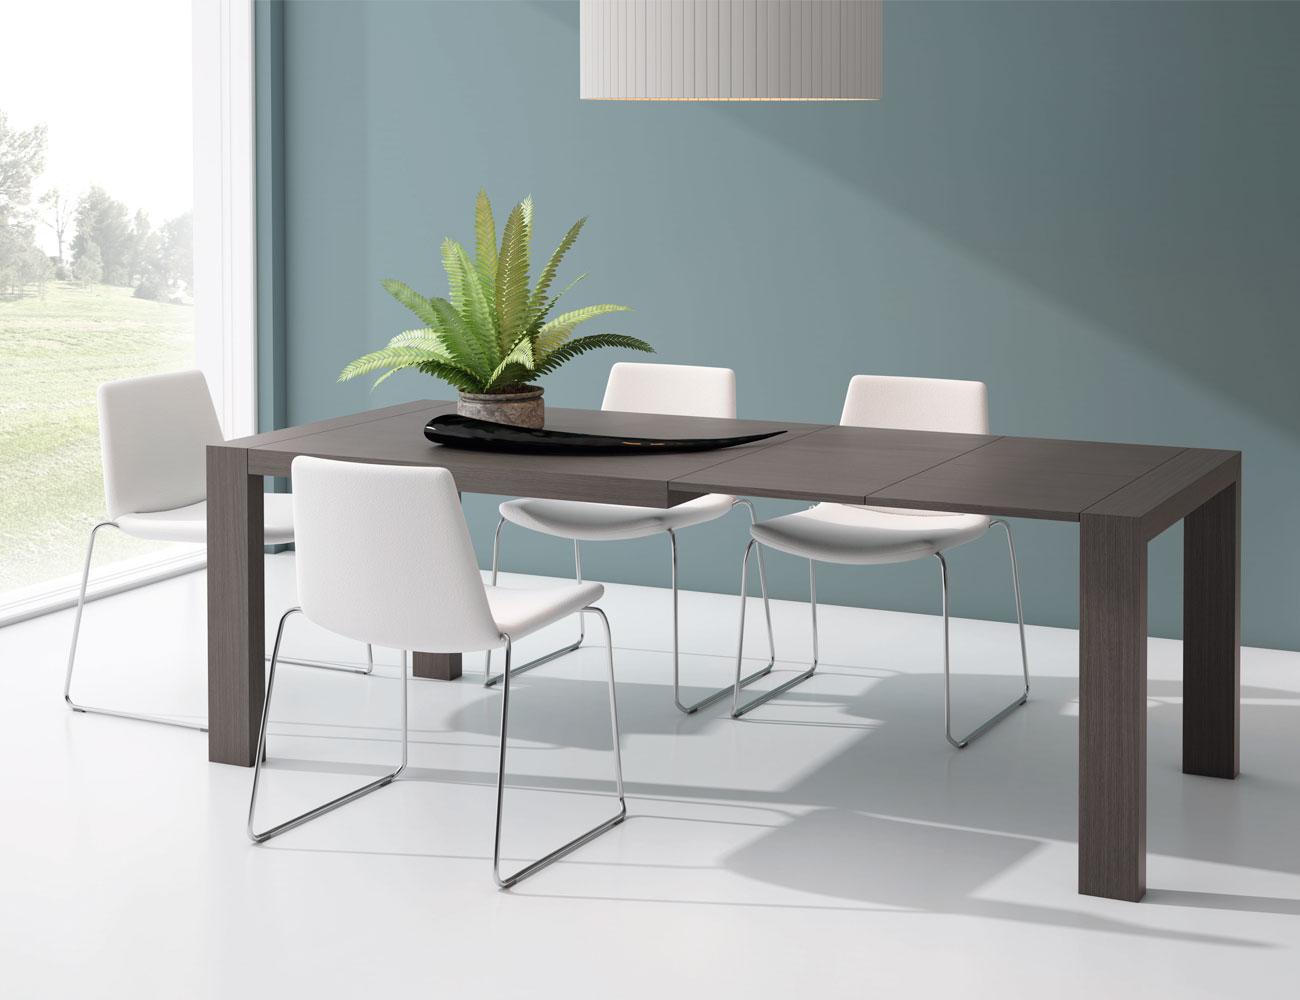 M223 mesa comedor rectangular extensible abierta ceniza19